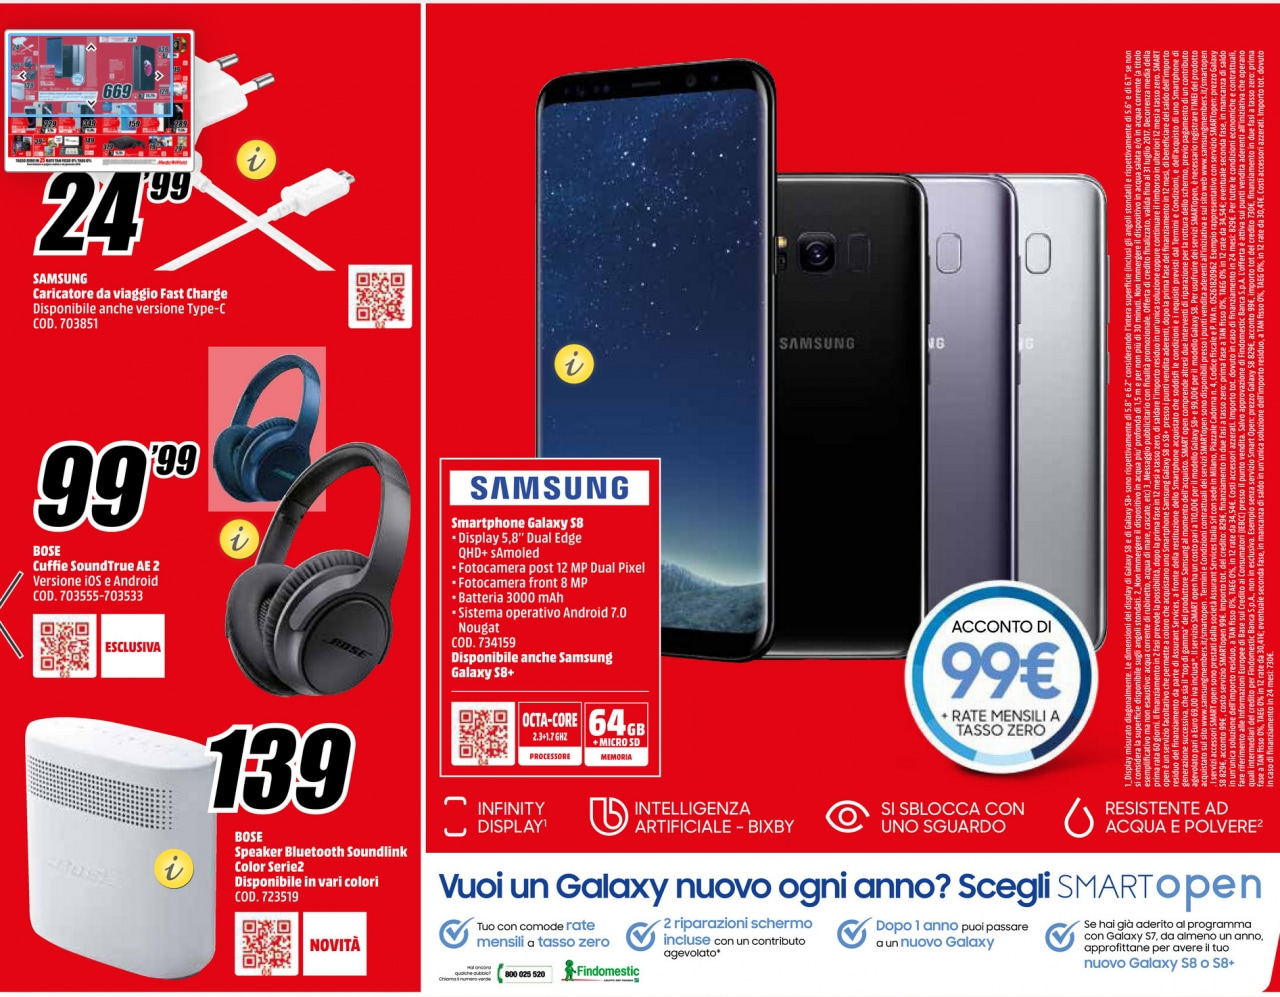 2932x2932 Pubg Android Game 4k Ipad Pro Retina Display Hd: Volantino MediaWorld 27 Luglio